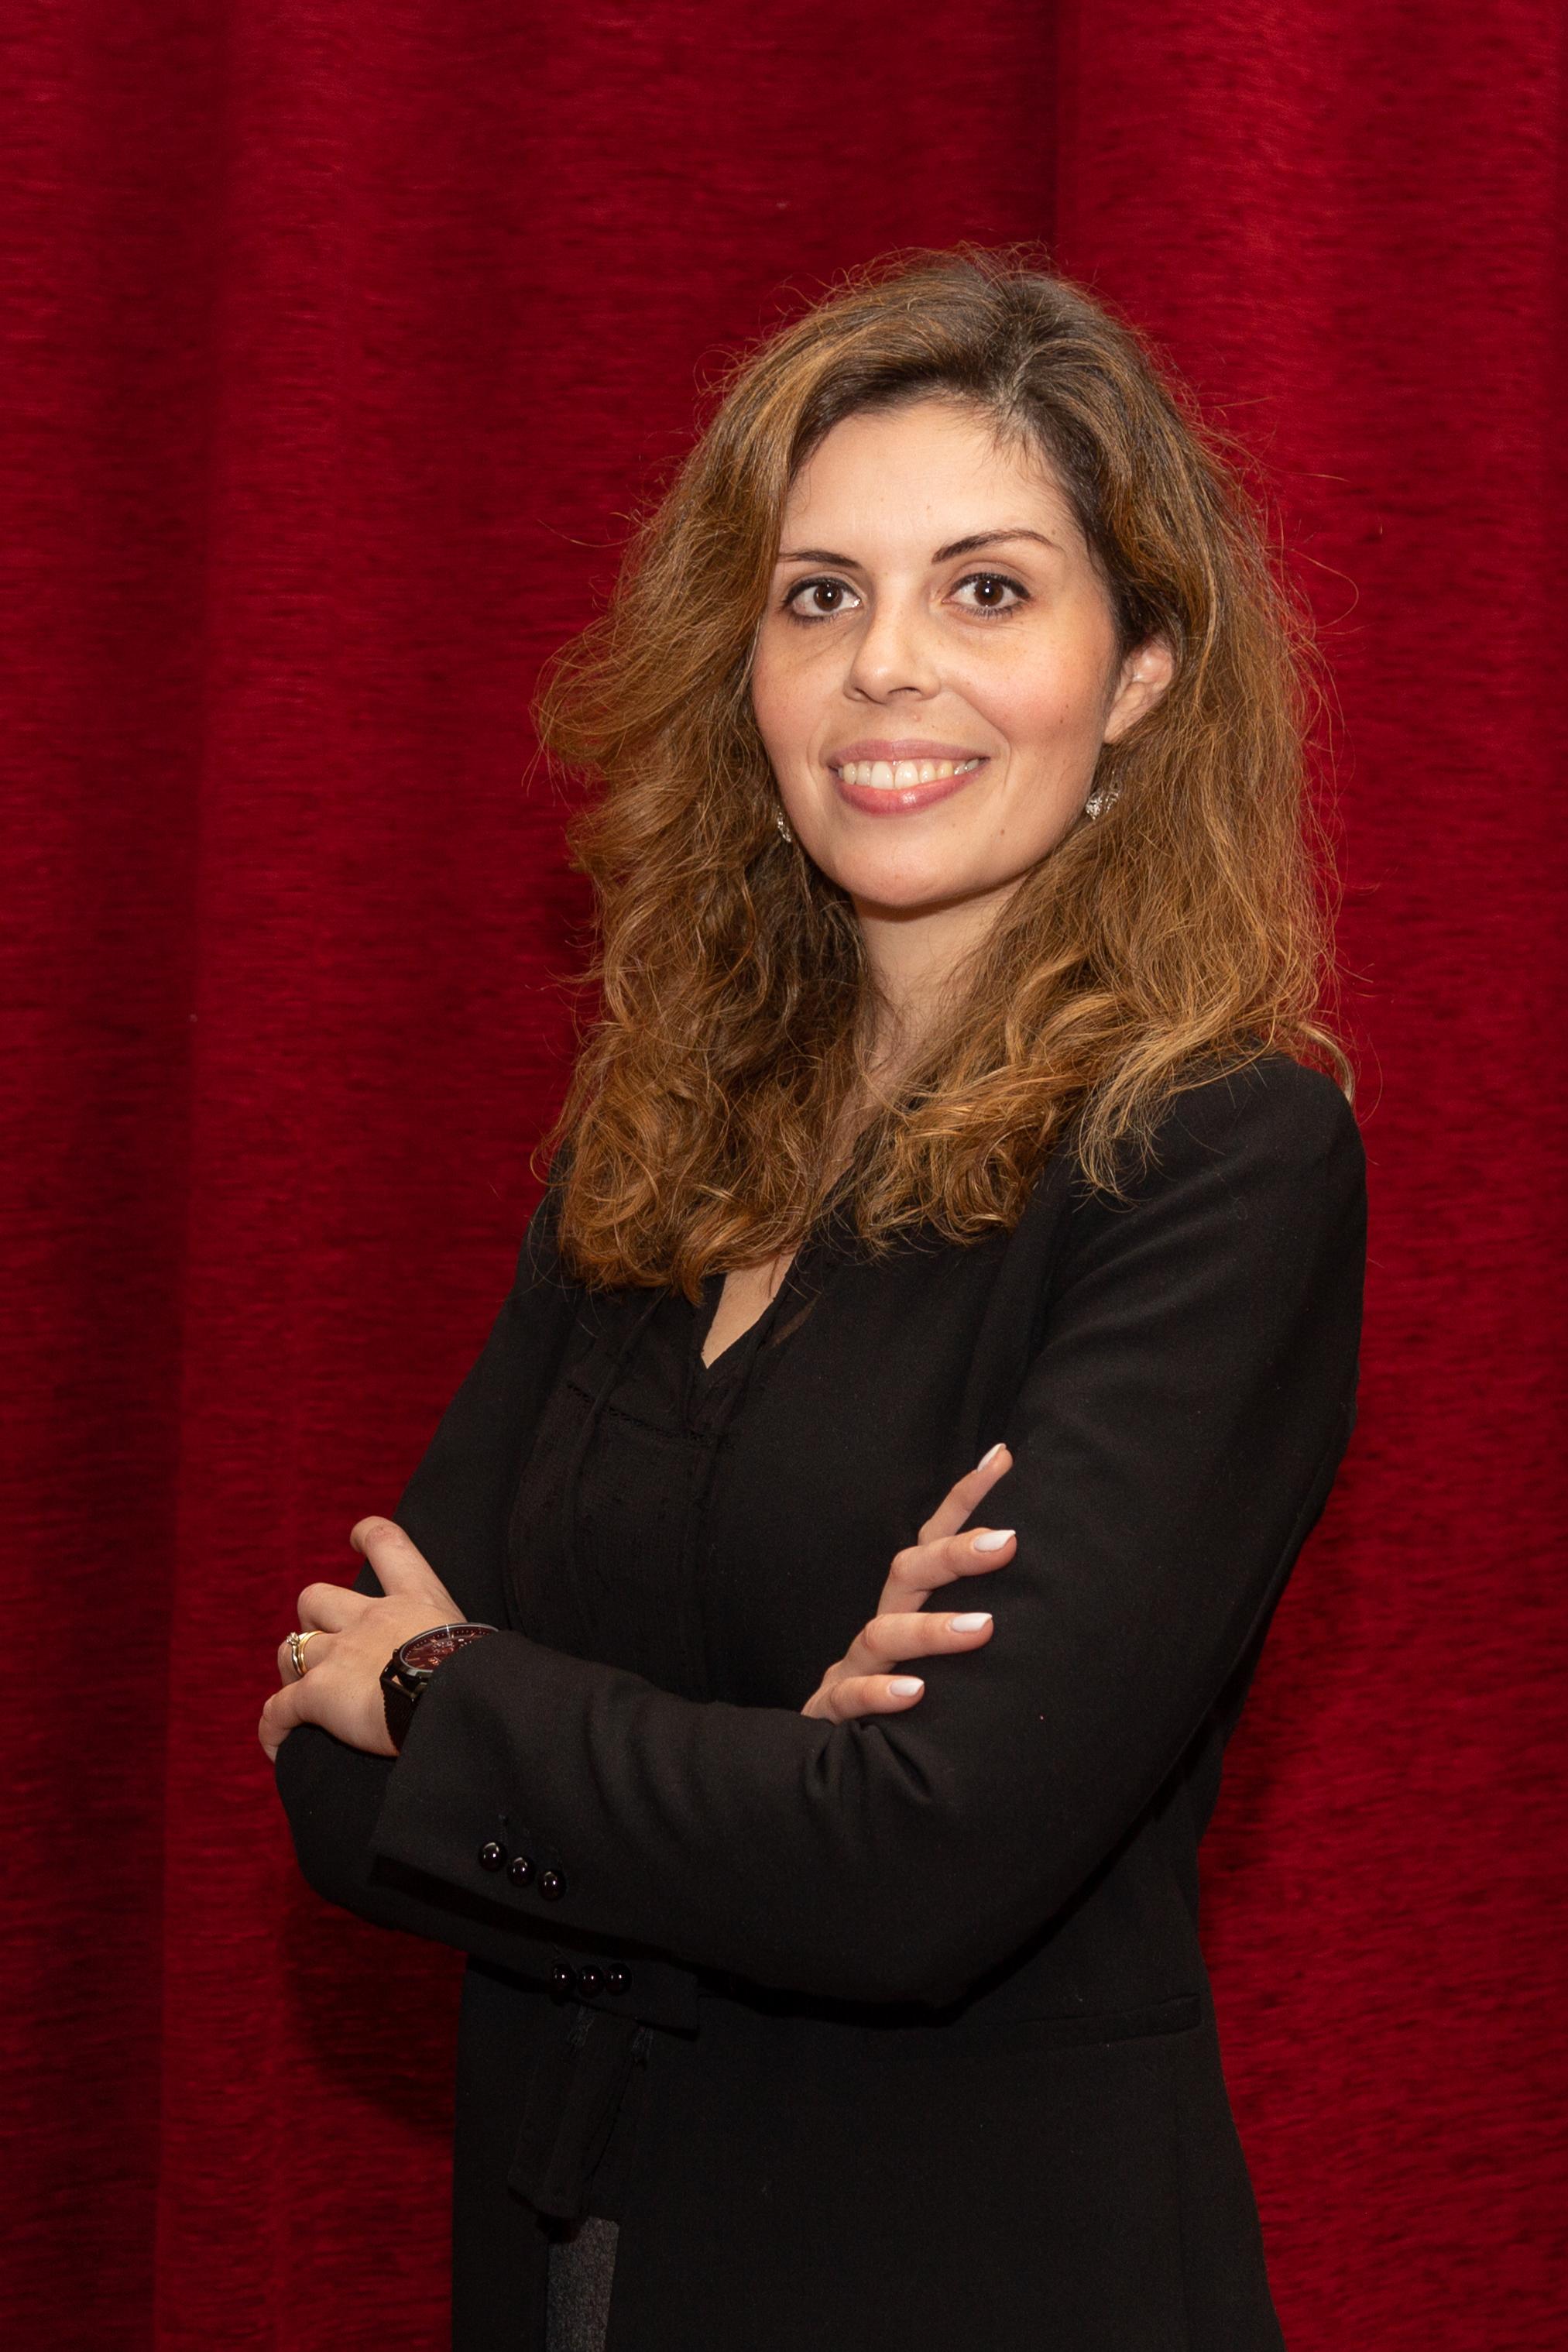 Marisa Baeta Mendonça